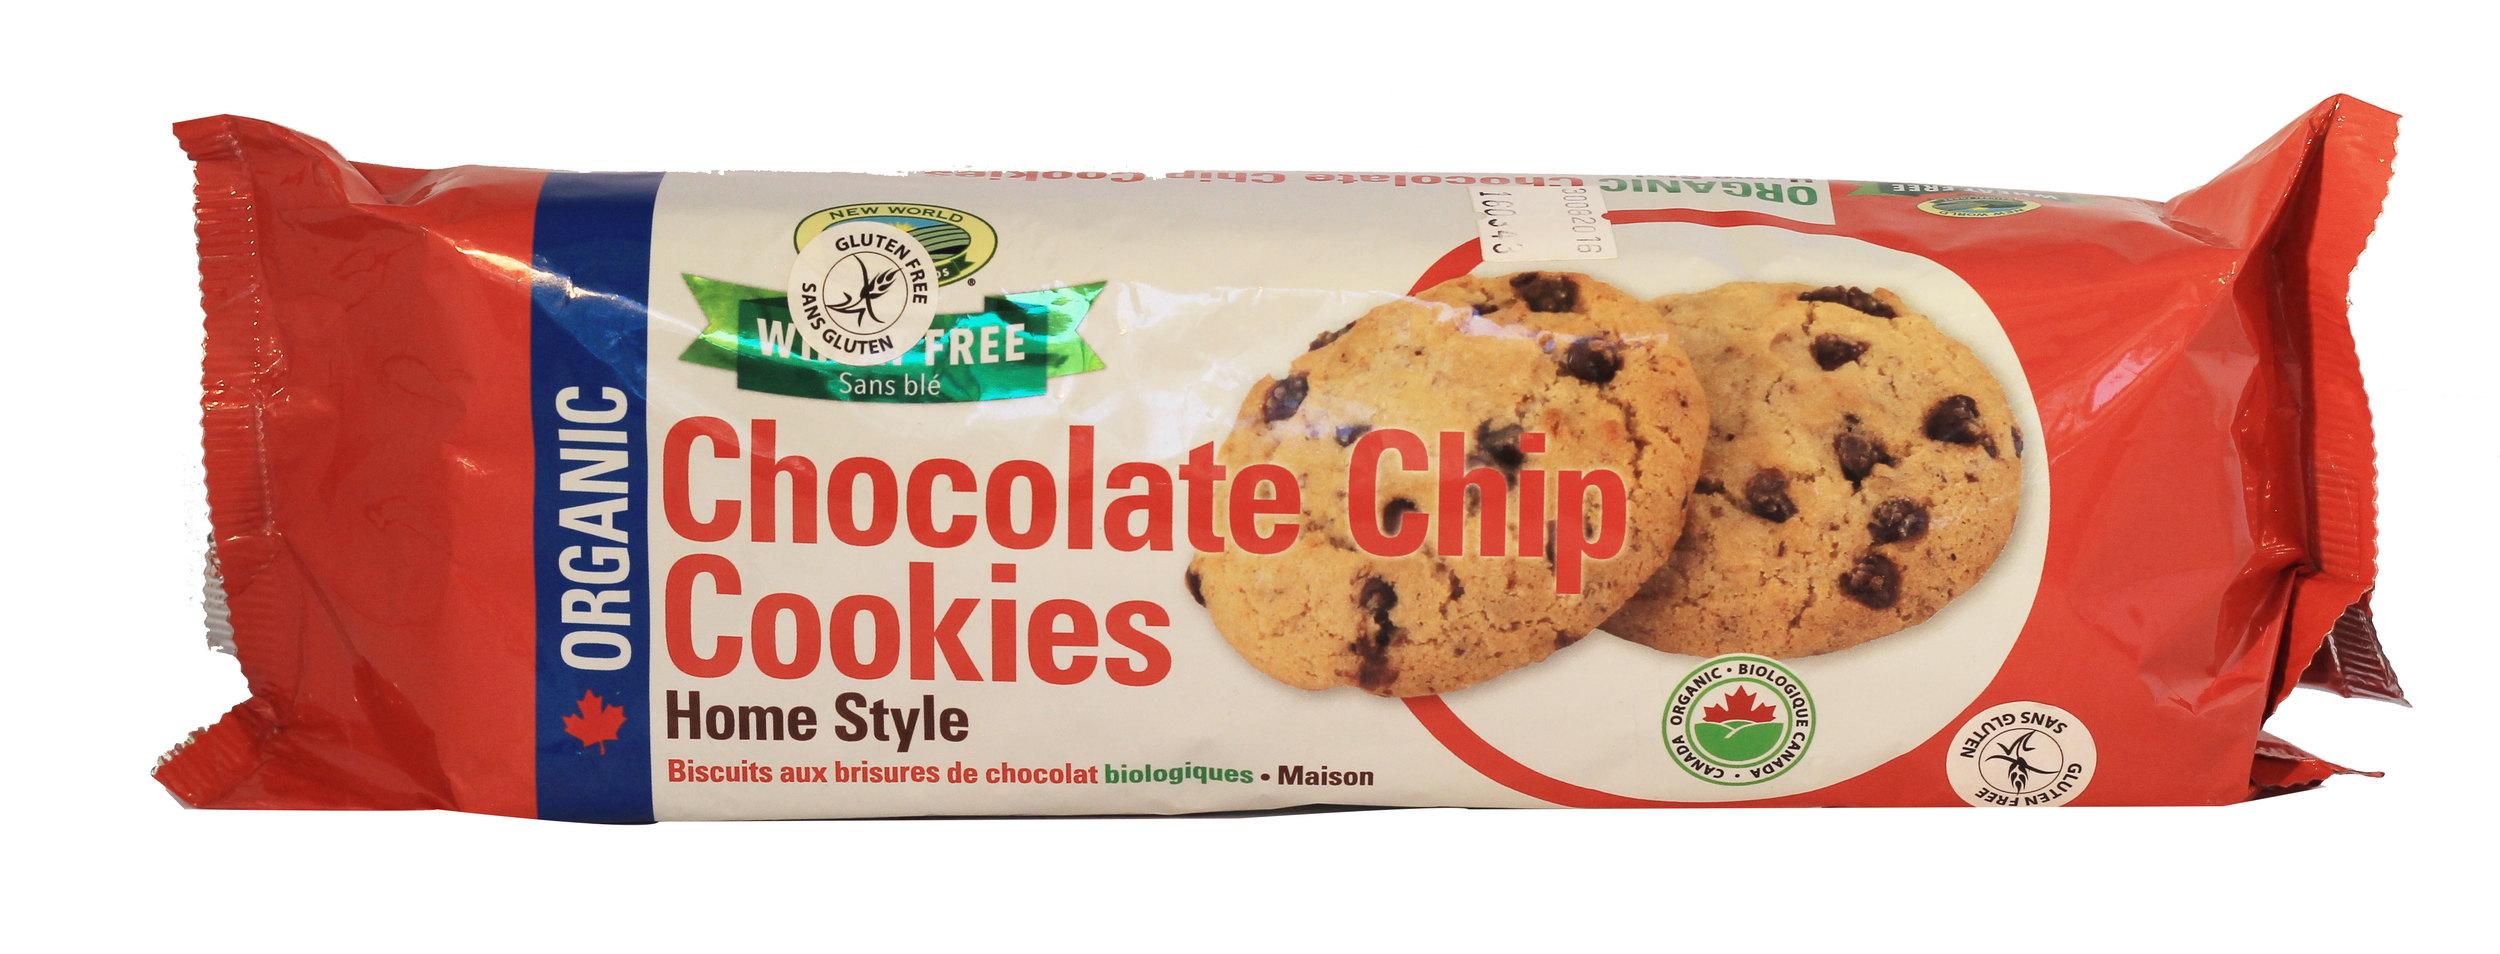 chocolate-chip-cookies-wheat-free-organic-web.jpg